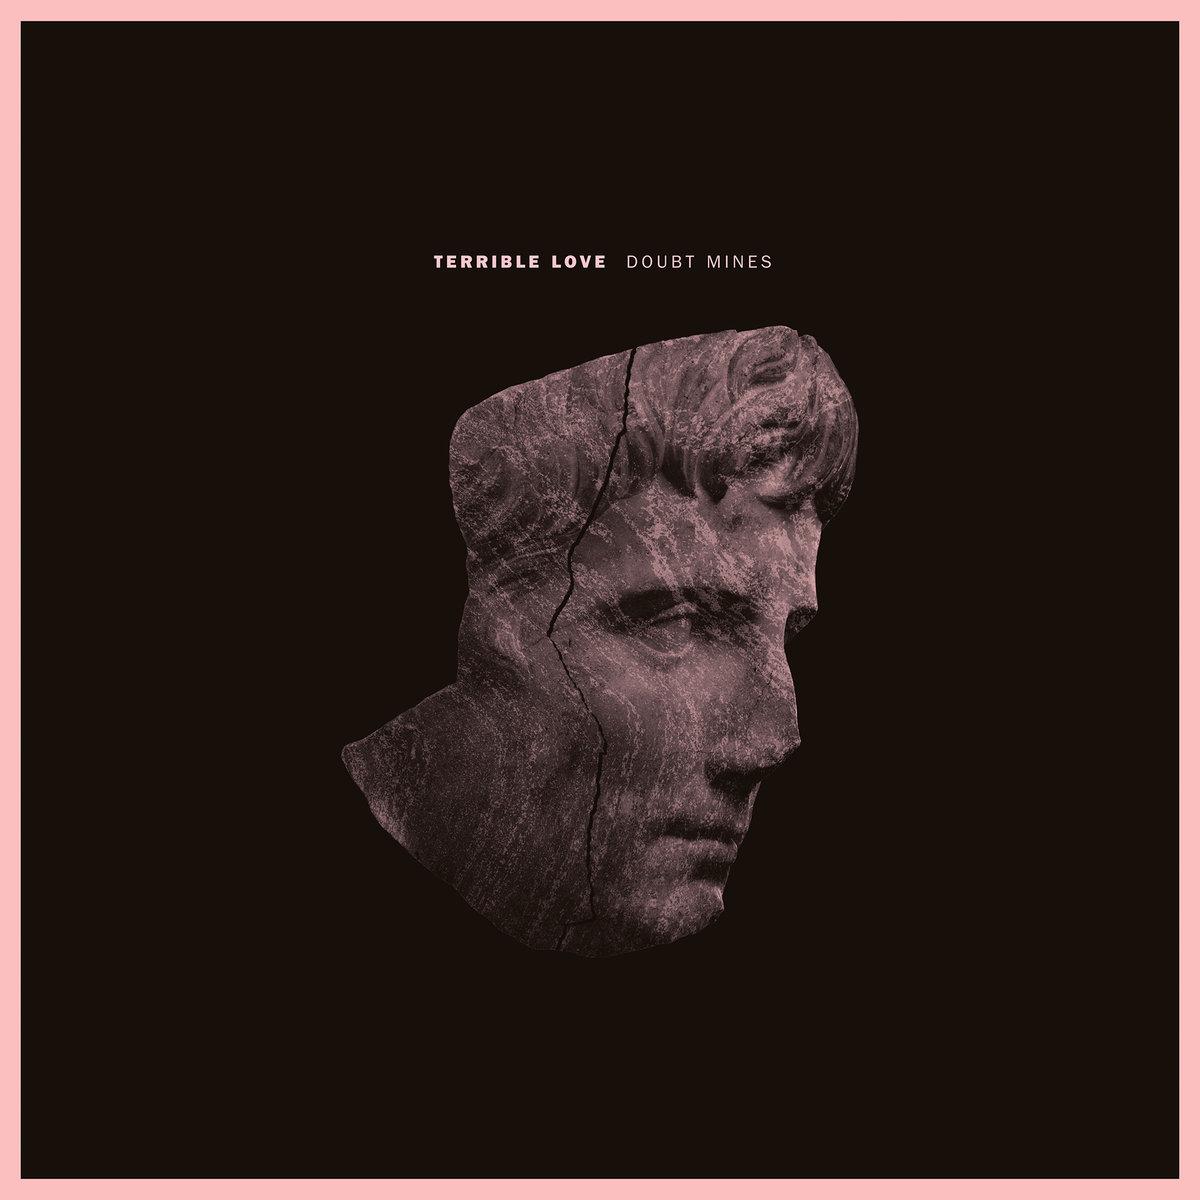 Terrible Love - Doubt Mines 12